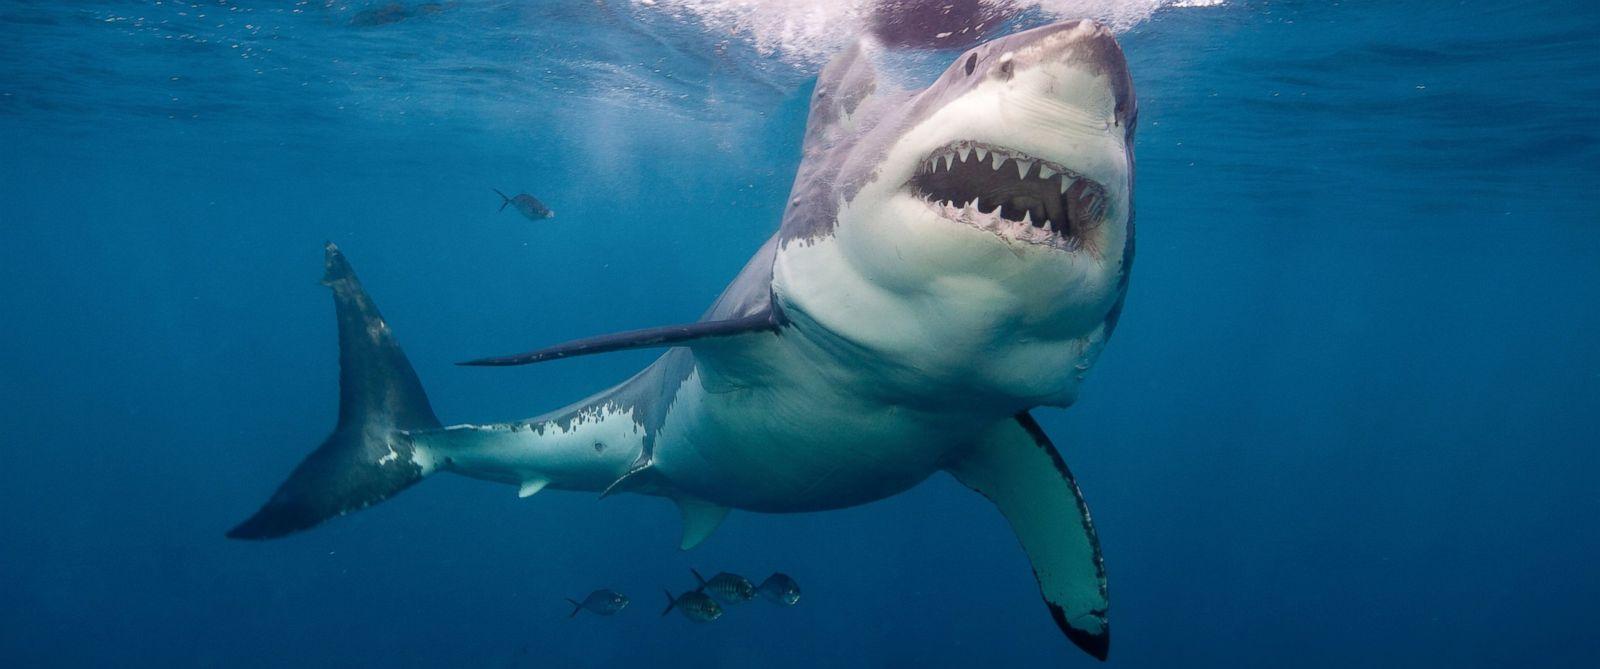 Tiburón Blanco tiburones